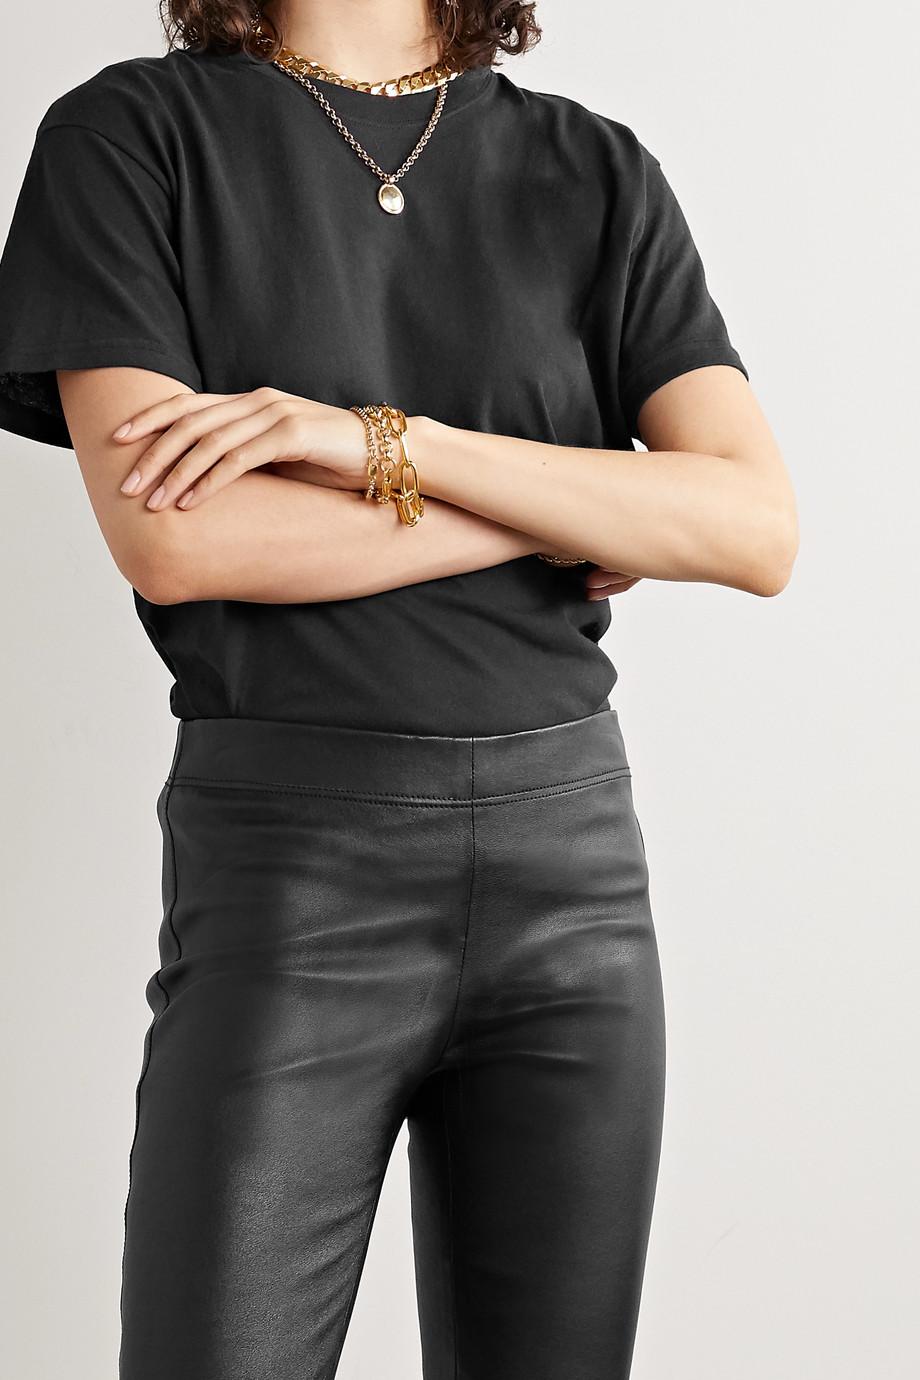 856ec75d729d6 Joseph Stretch-leather leggings